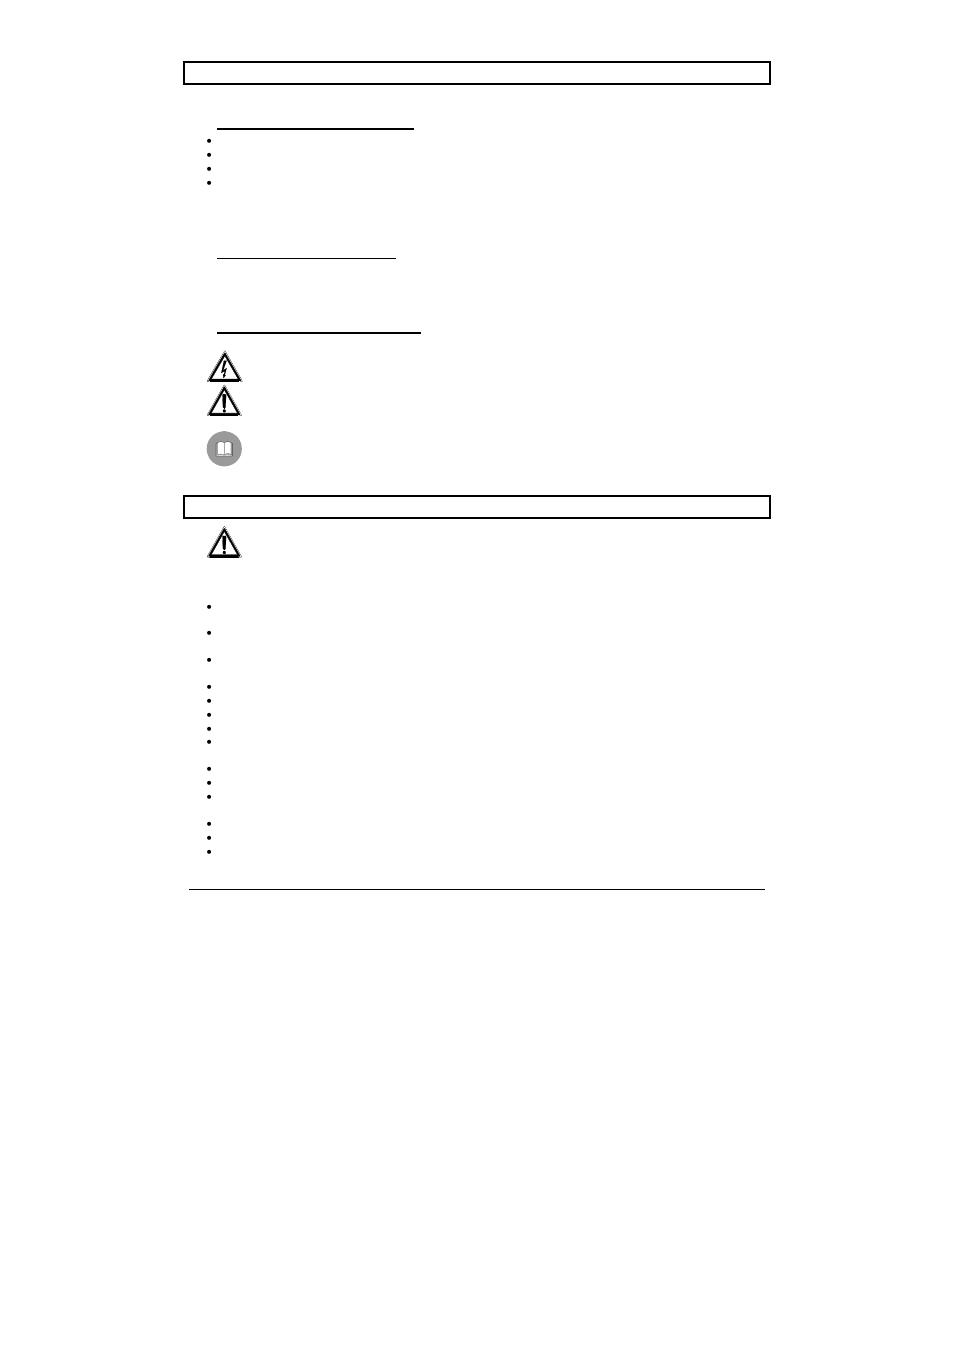 Videotec dtrx3 user manual page 33 108 biocorpaavc